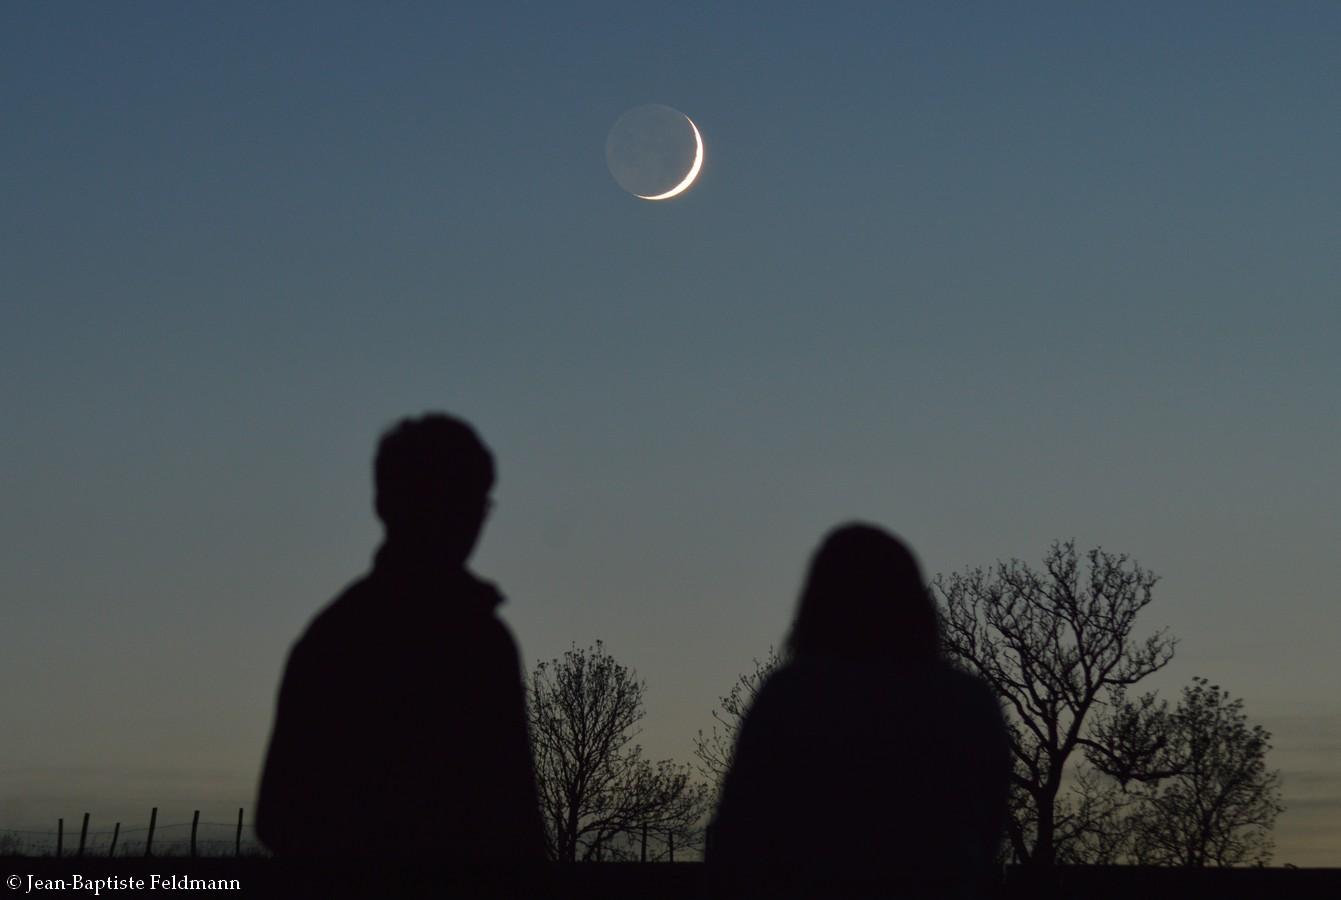 La lune par jean baptiste feldmann - Date lune rousse 2017 ...